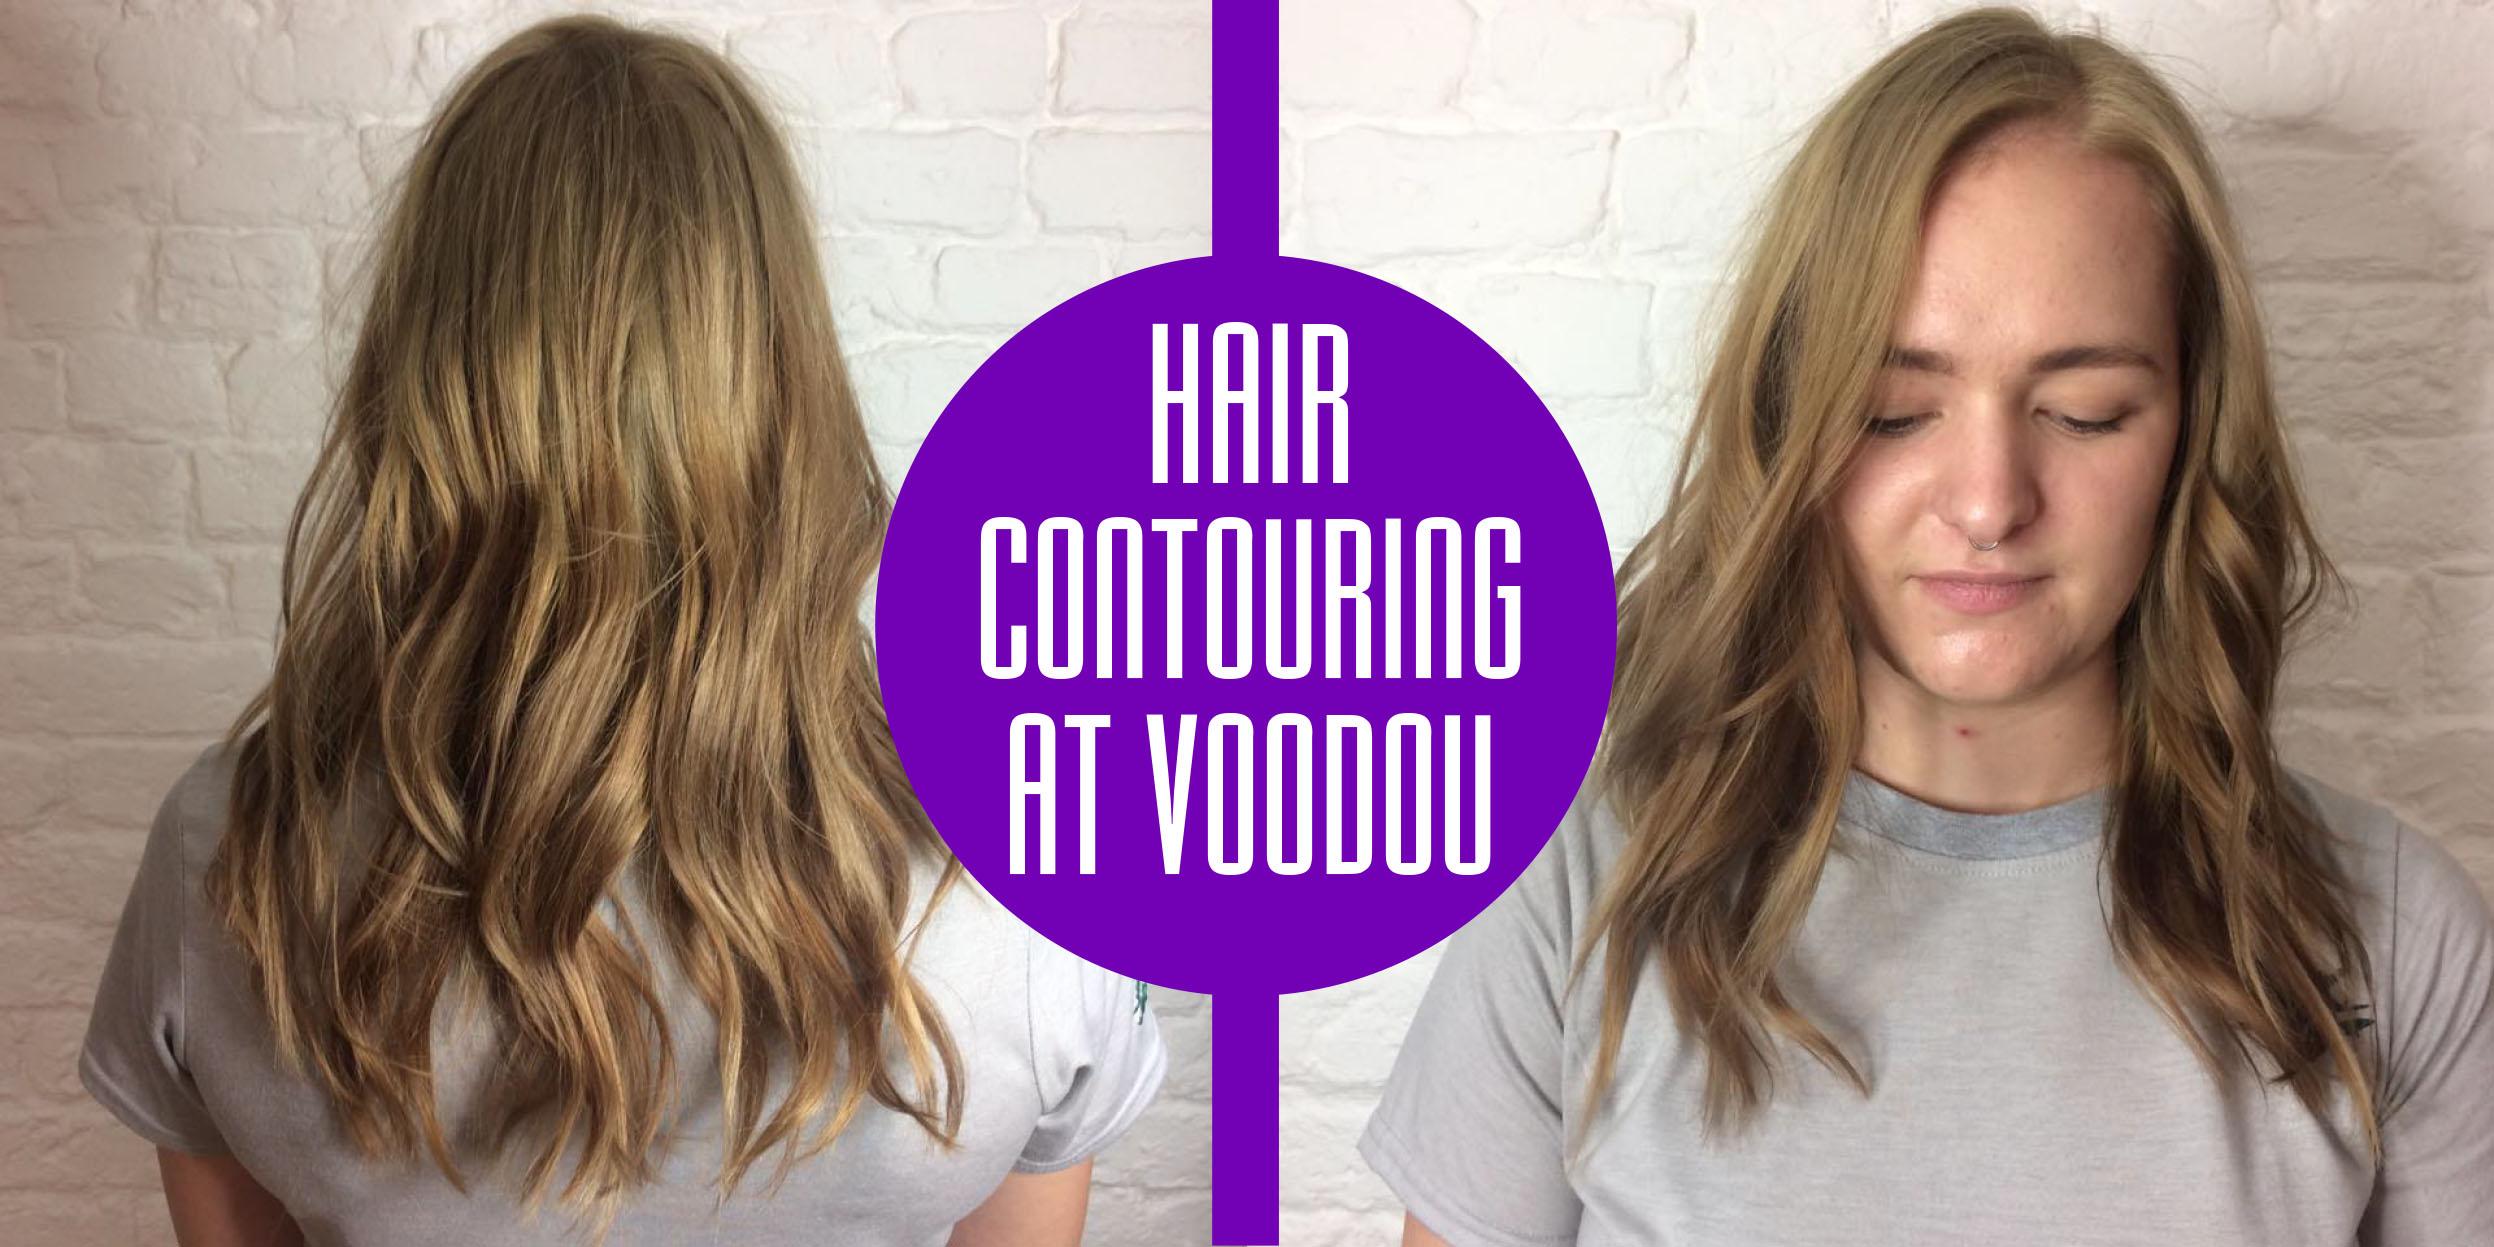 HAIR CONTOURING: HAIR TRENDS 2017